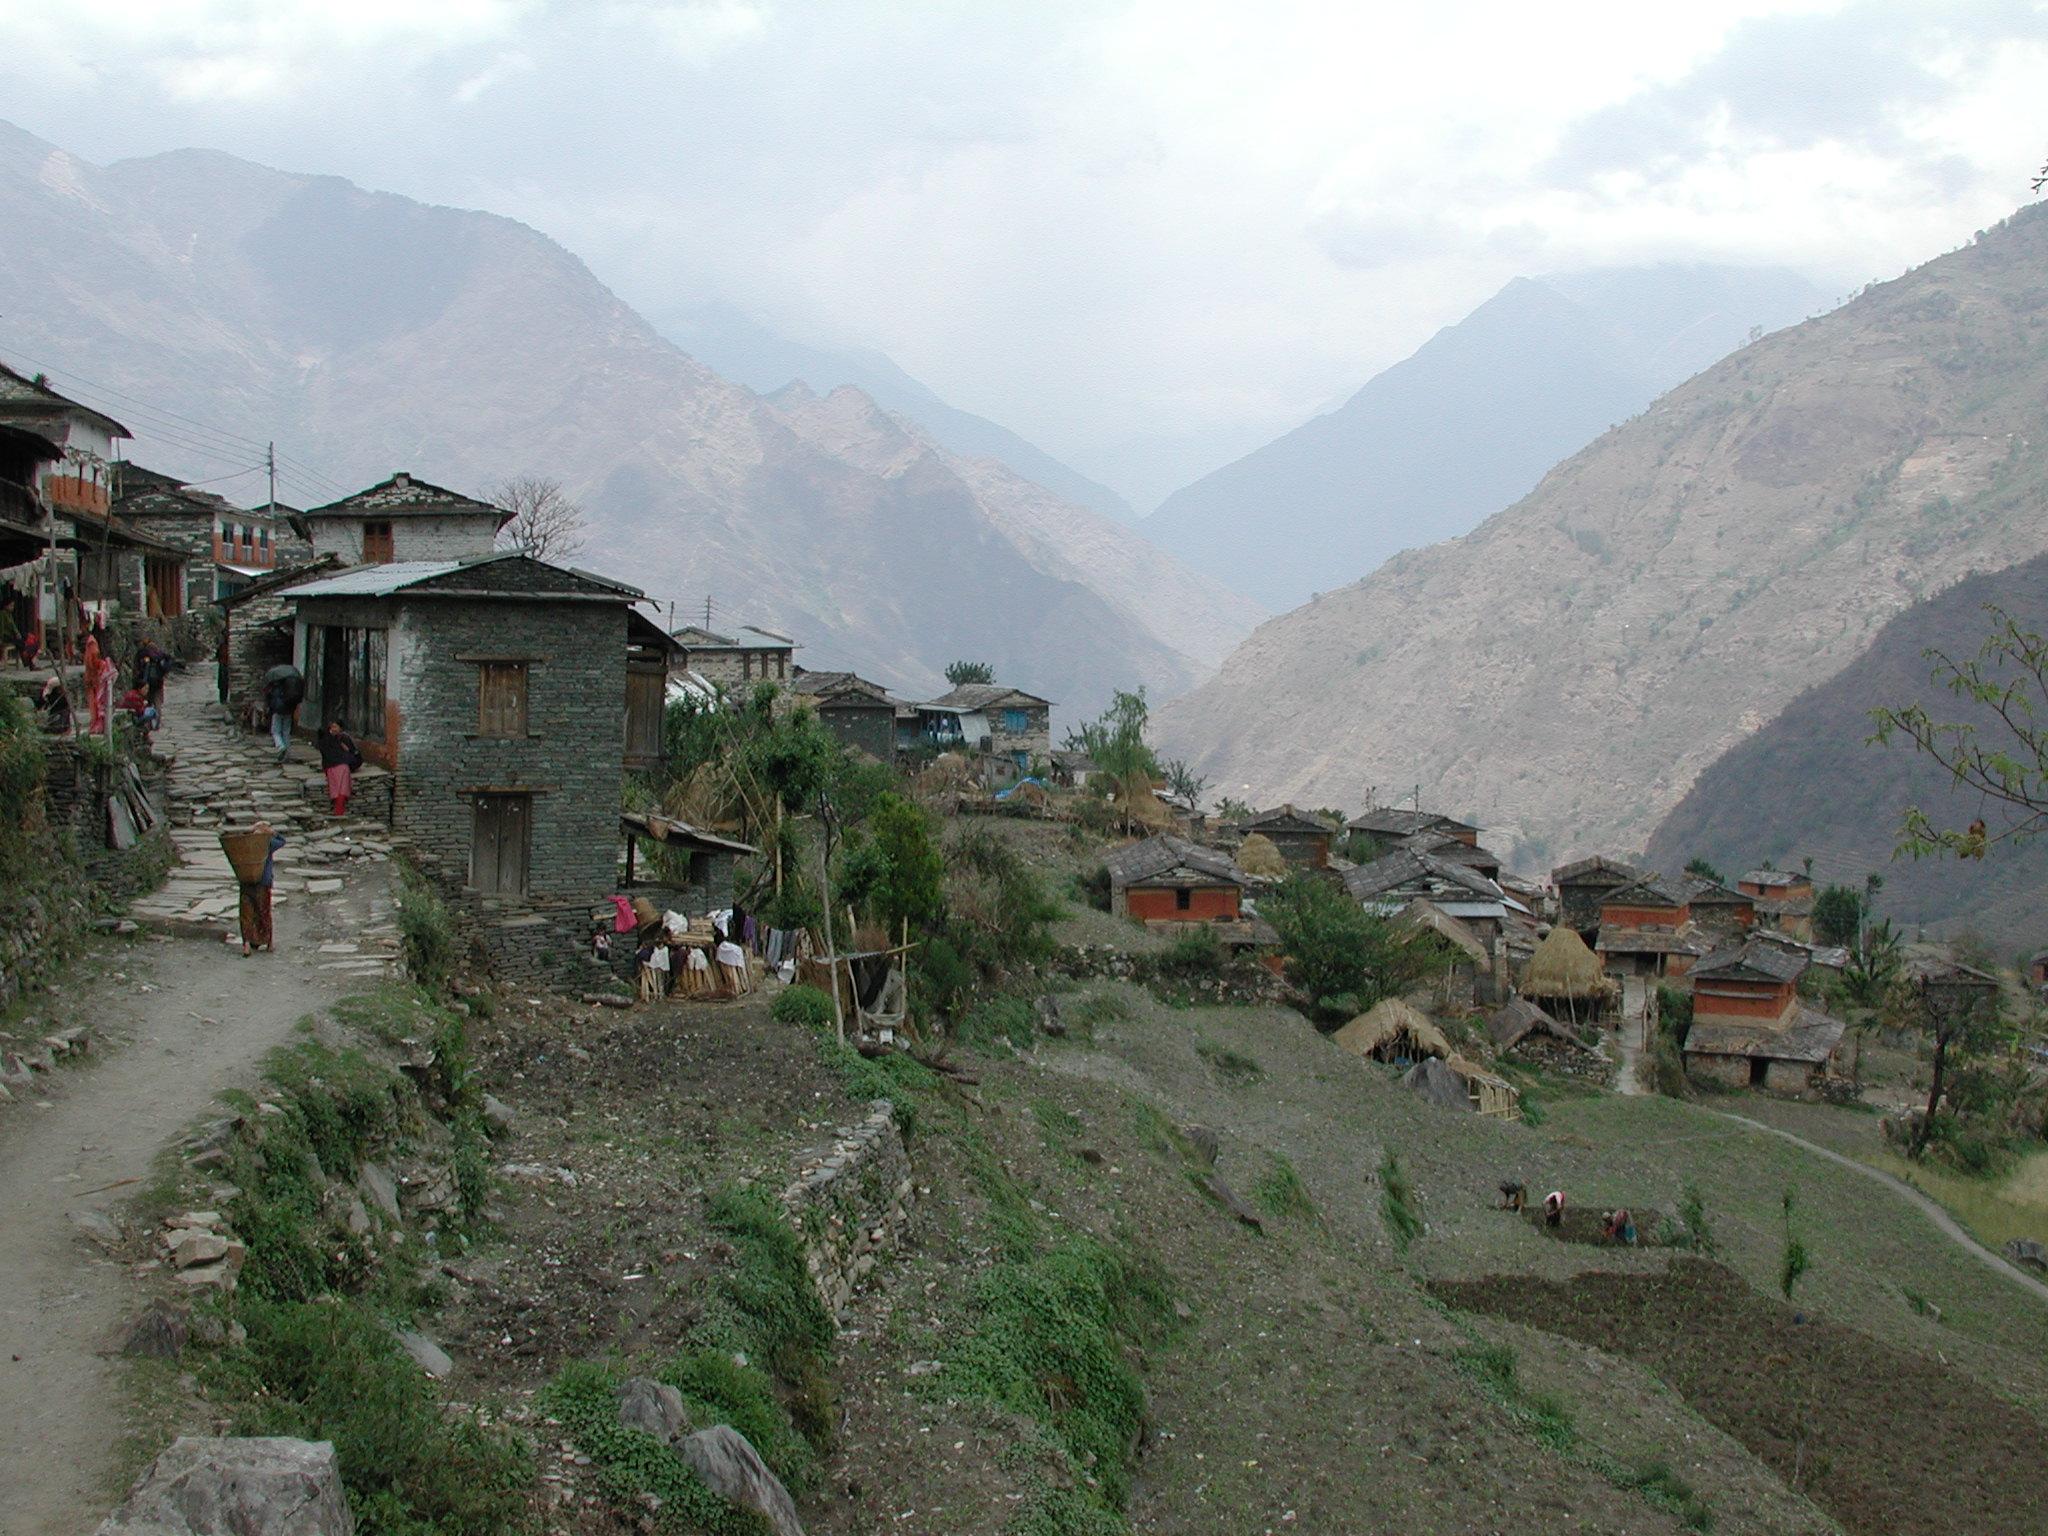 Nepal - Jomsom Trail